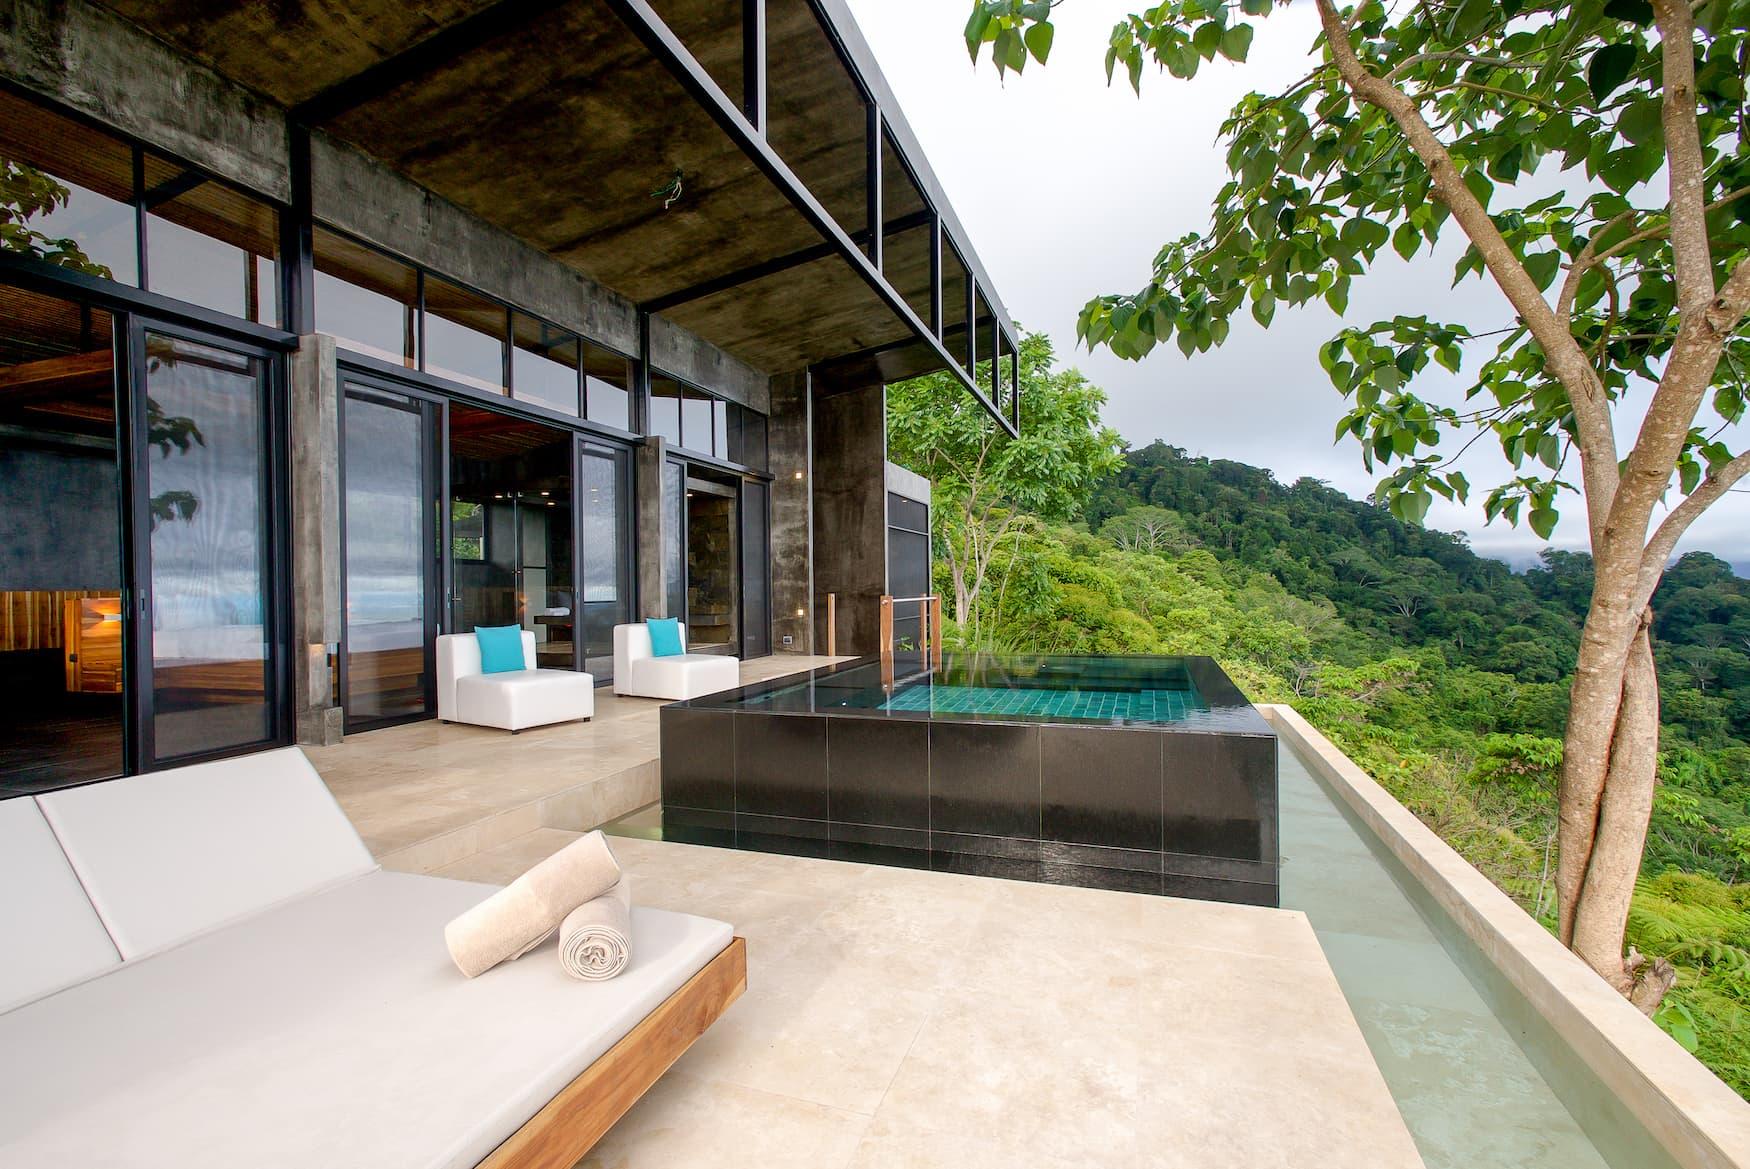 Hotel, Costa Rica, Hotelzimmer, Dschungel, uvita